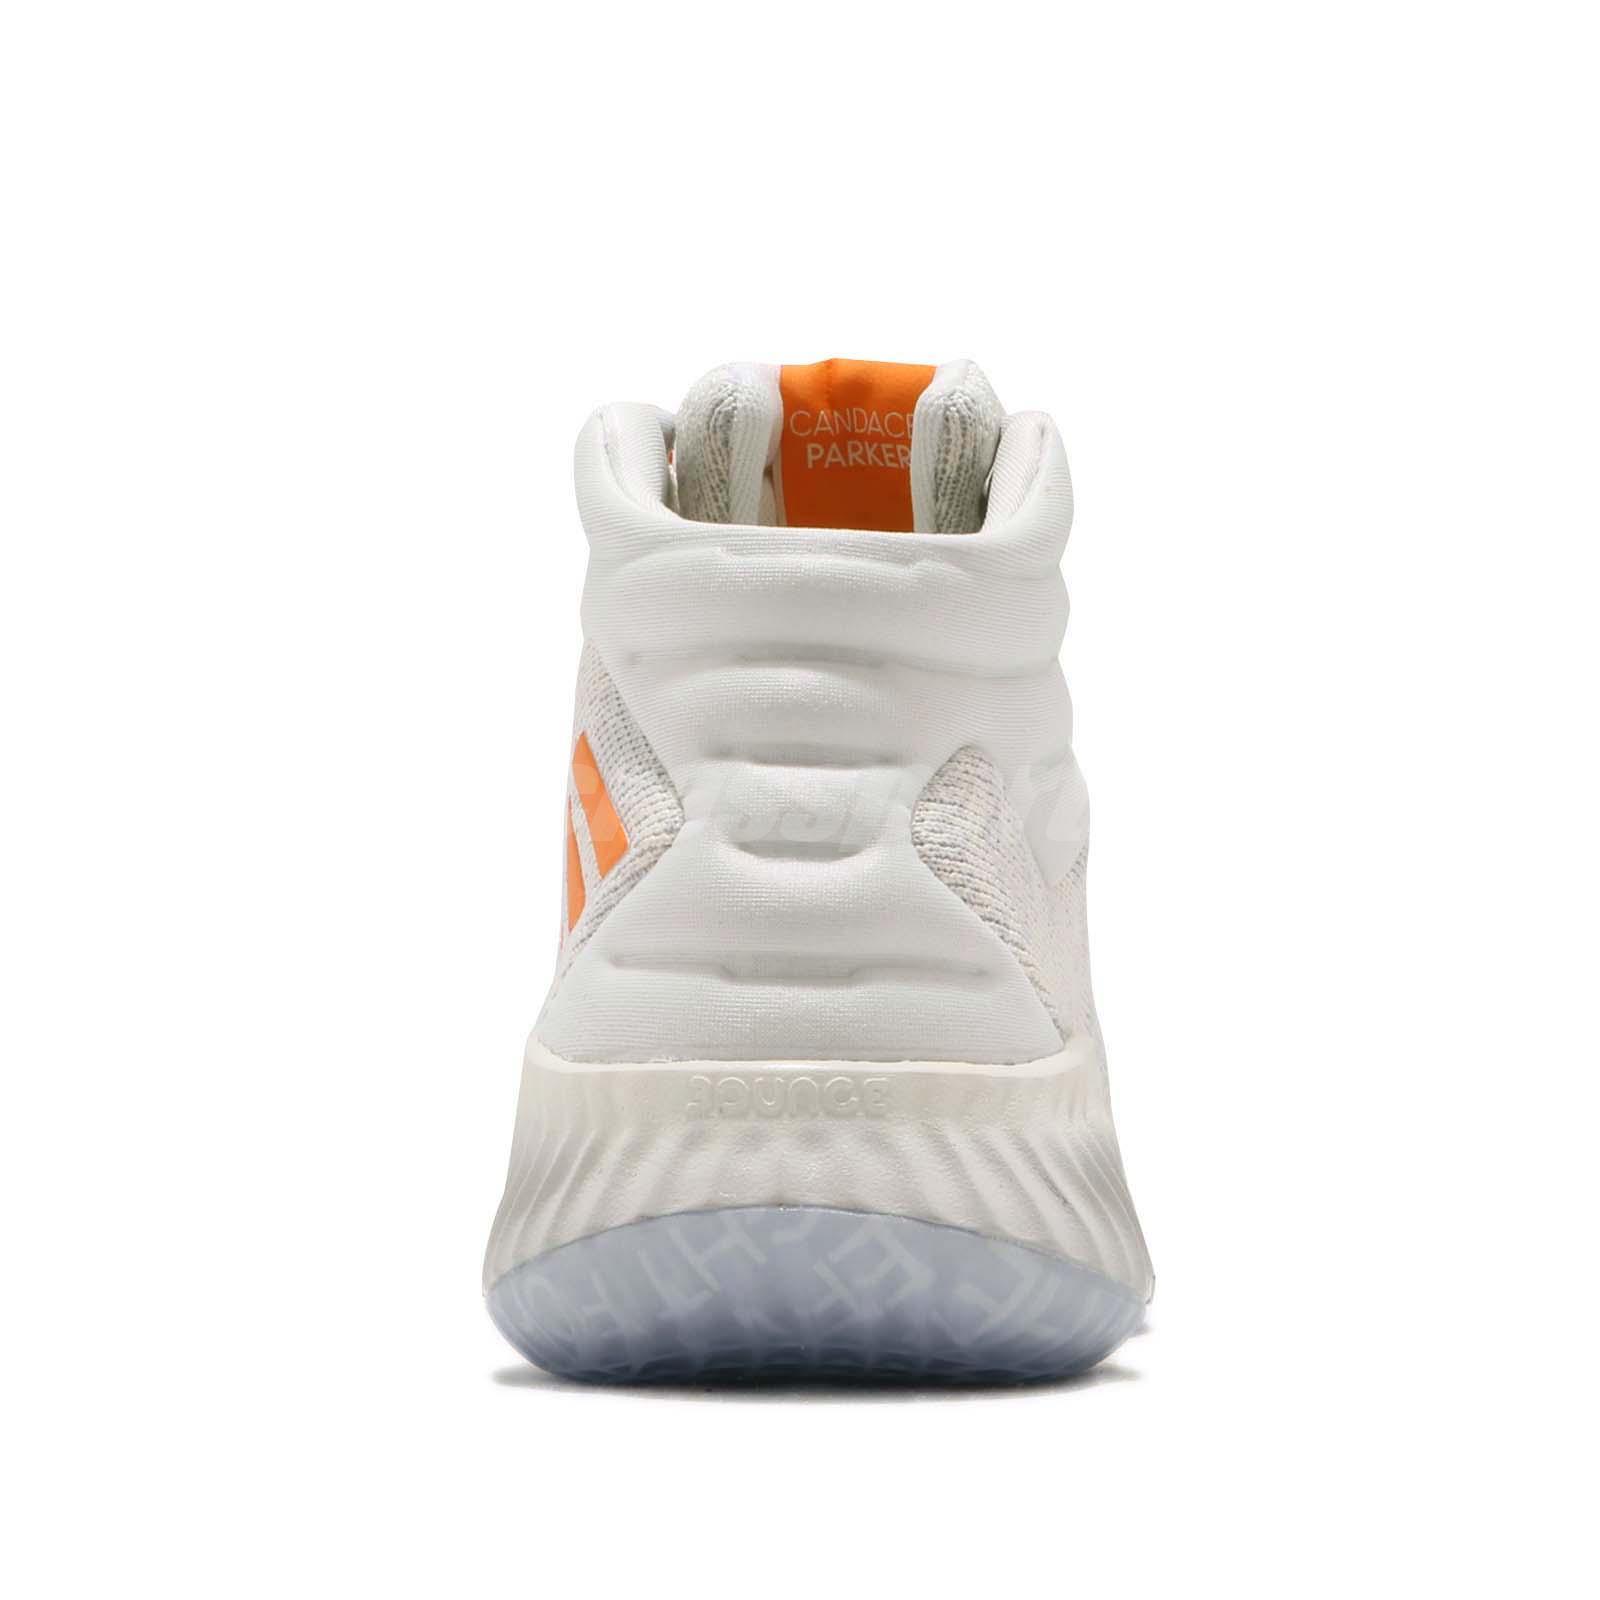 dd681efc22e5 Women s Shoes adidas PB Candace Parker Pro Bounce 18 Off White Orange Women  Basketball F97243